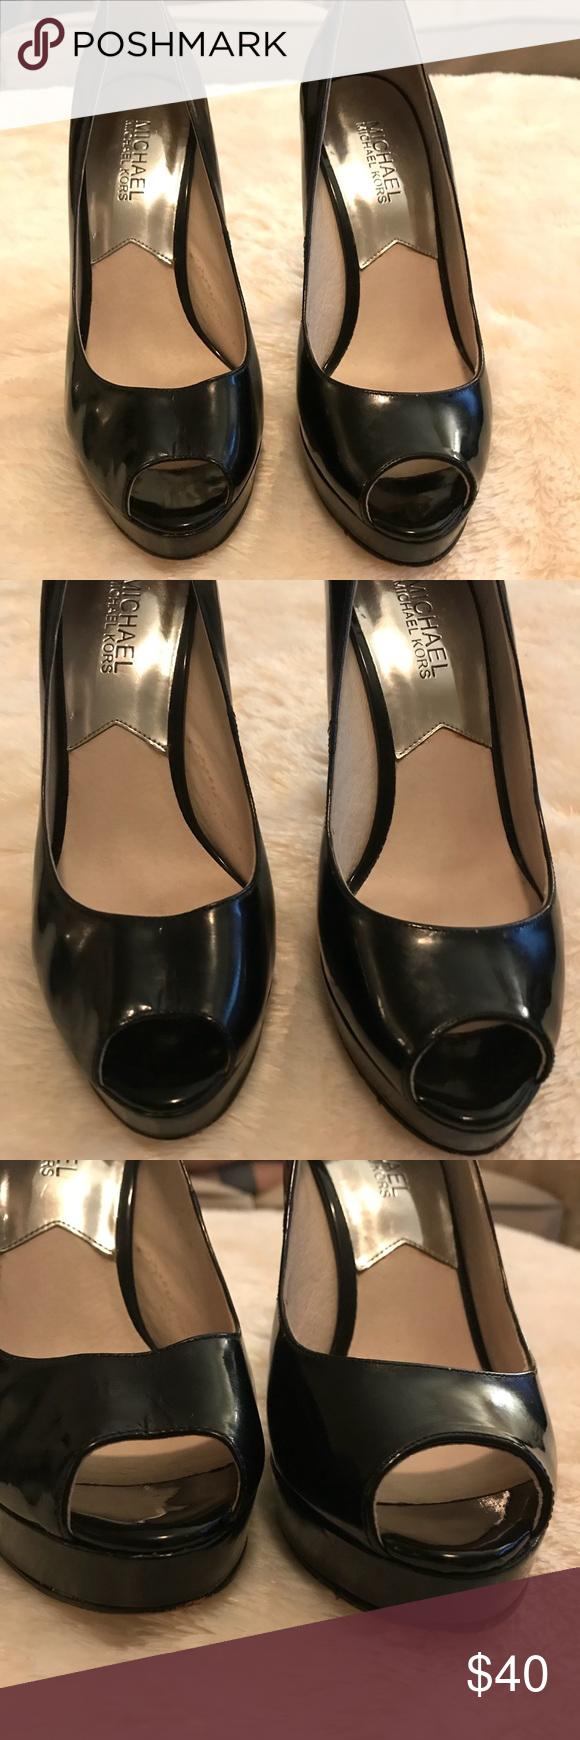 "c99307070d34 Michael Kors patent peep toe platform heels Michael Kors ""Erika"" Black  patent leather Round"